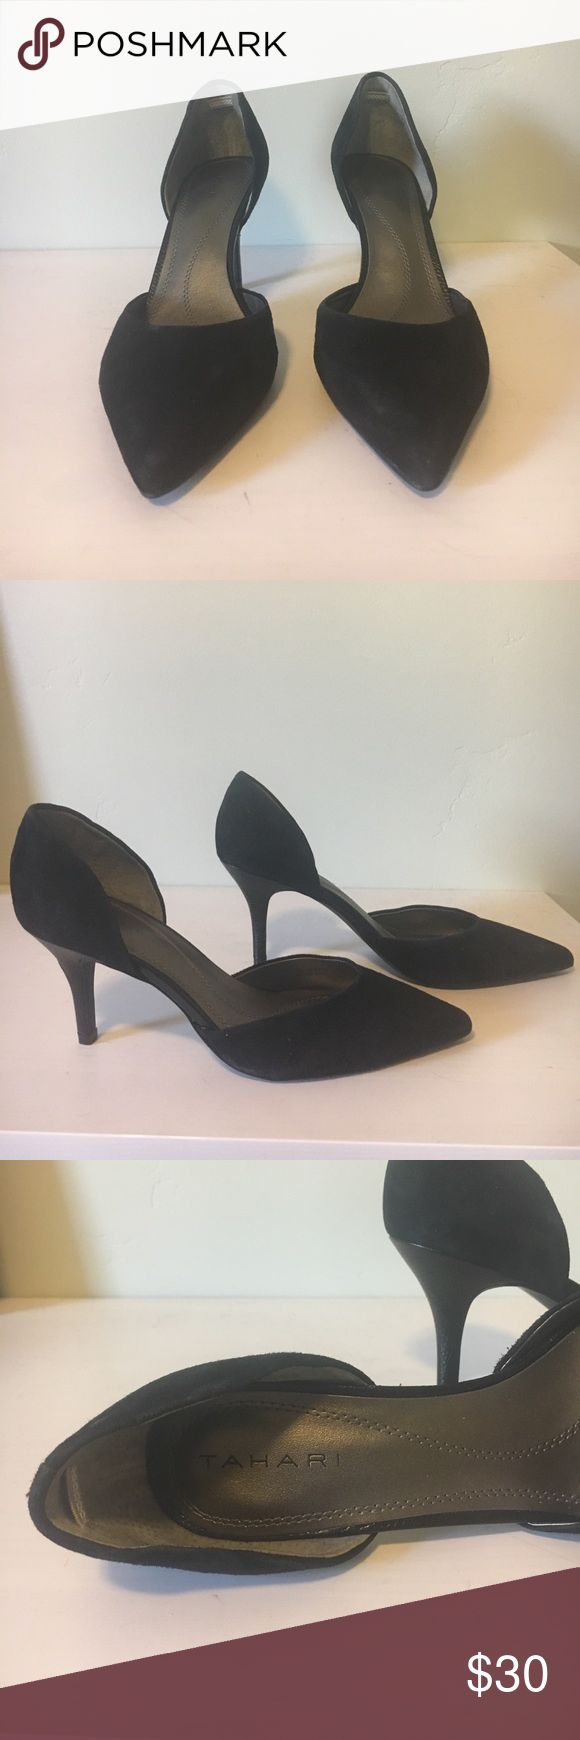 Tahari black heels. Size 7.5, 2.5 inch heels Black suede Tahari heels, size 7.5, with 2.5 inch heel. Never worn. Tahari Shoes Heels